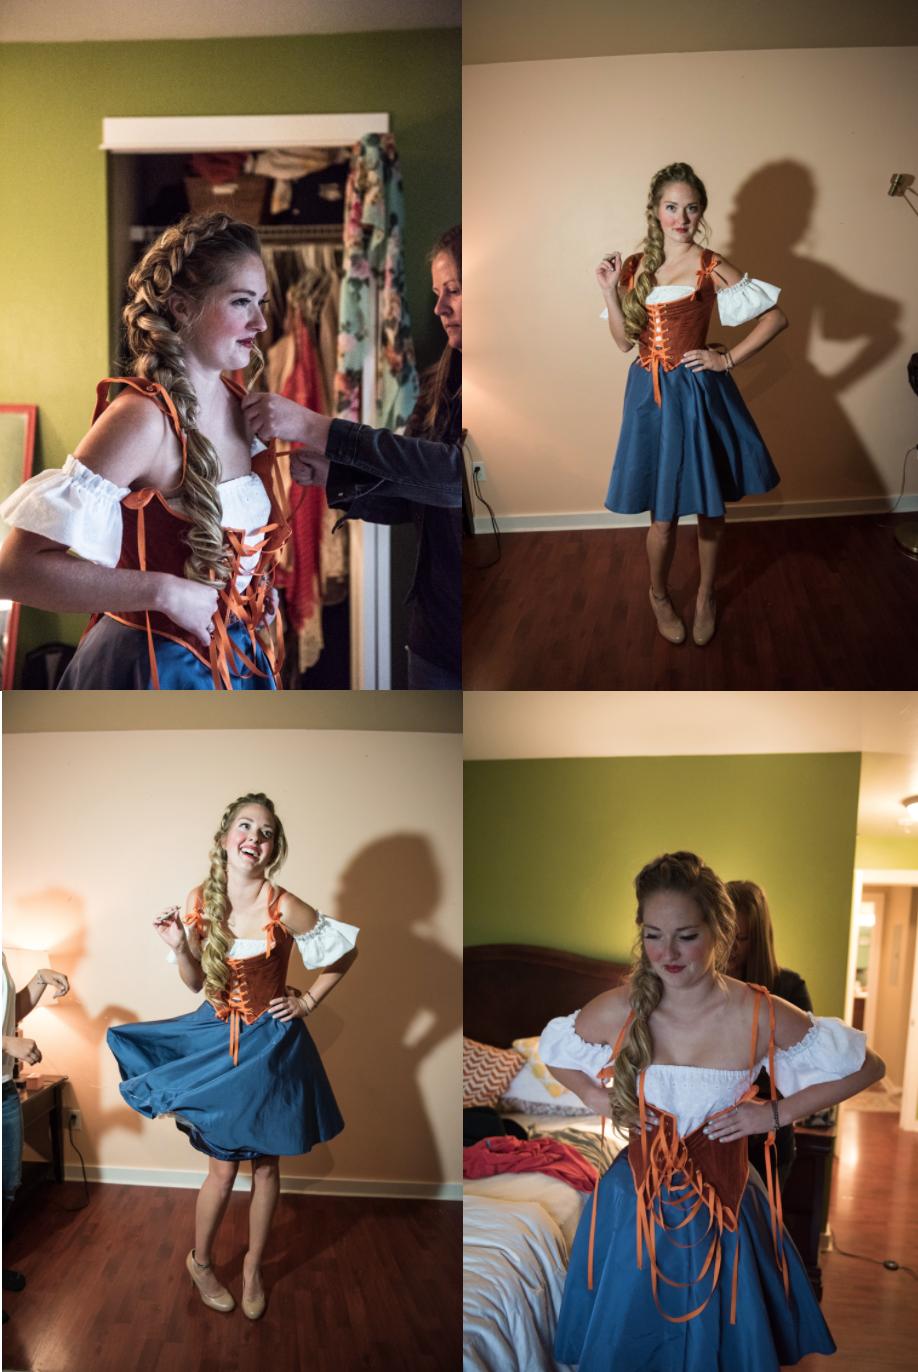 Custom-designed corset for the Dutch Valley shoot.